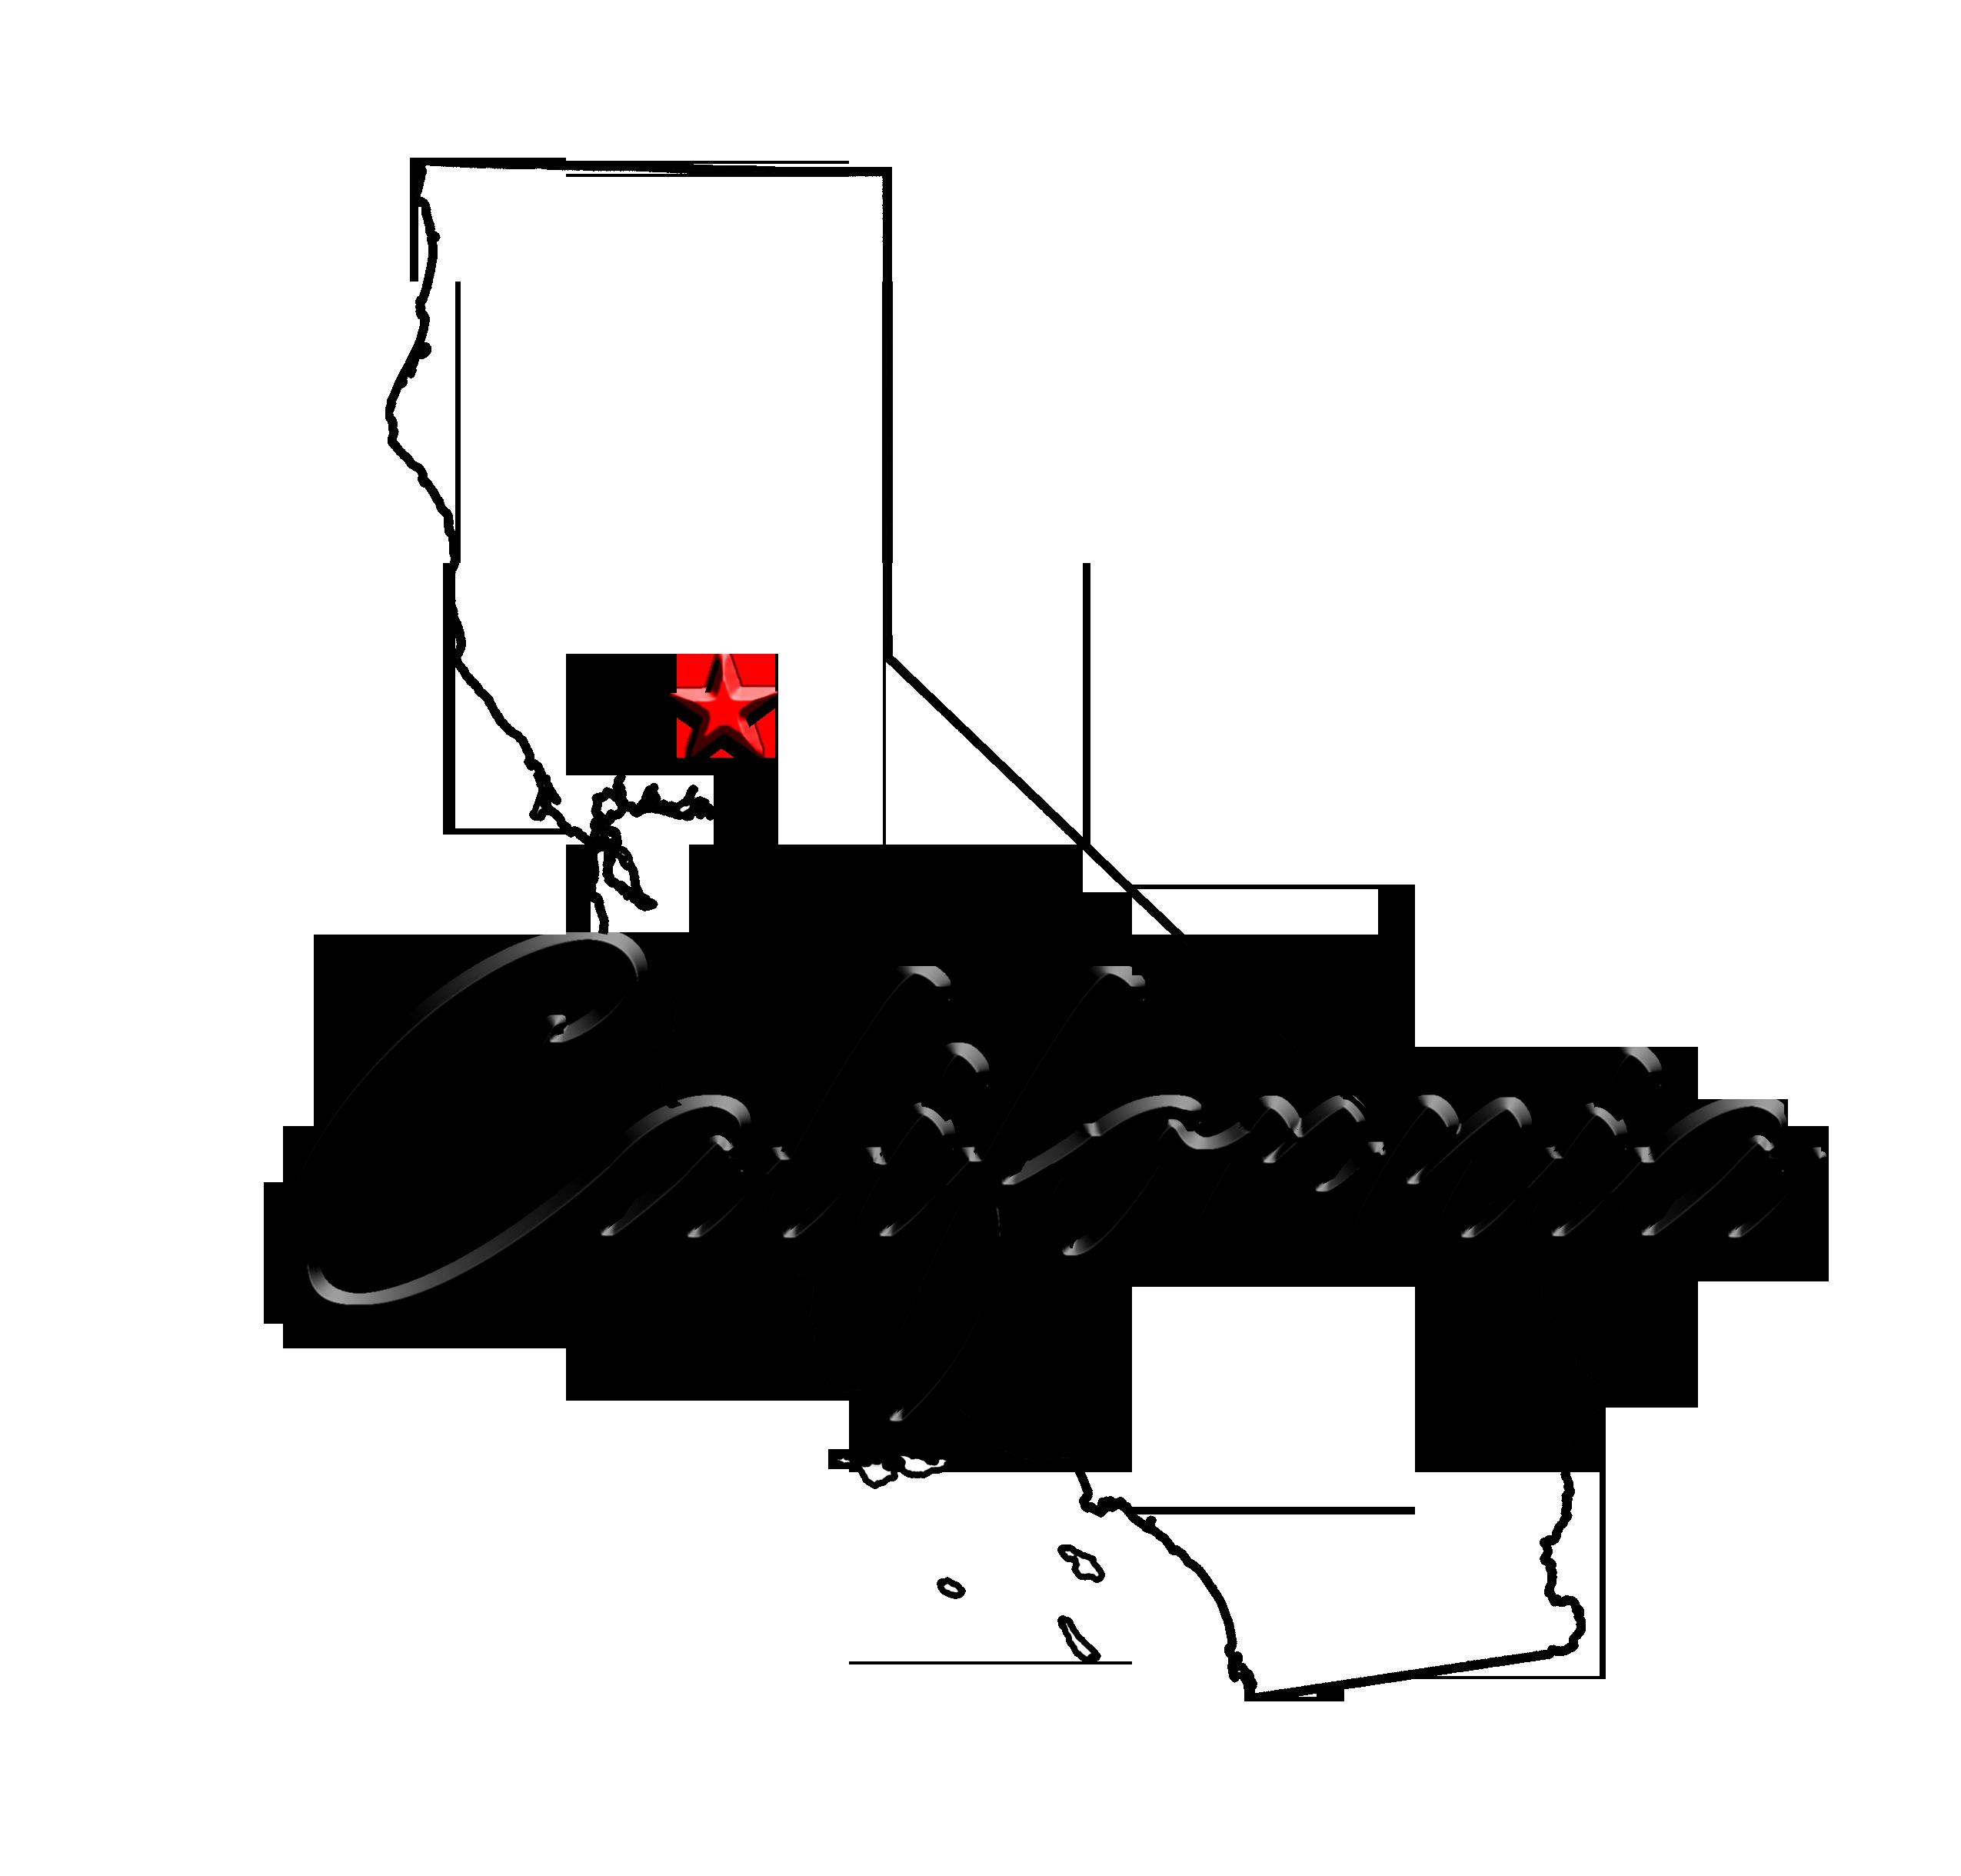 California Hd Hq High Brand New Cali Logo Design Tattoo